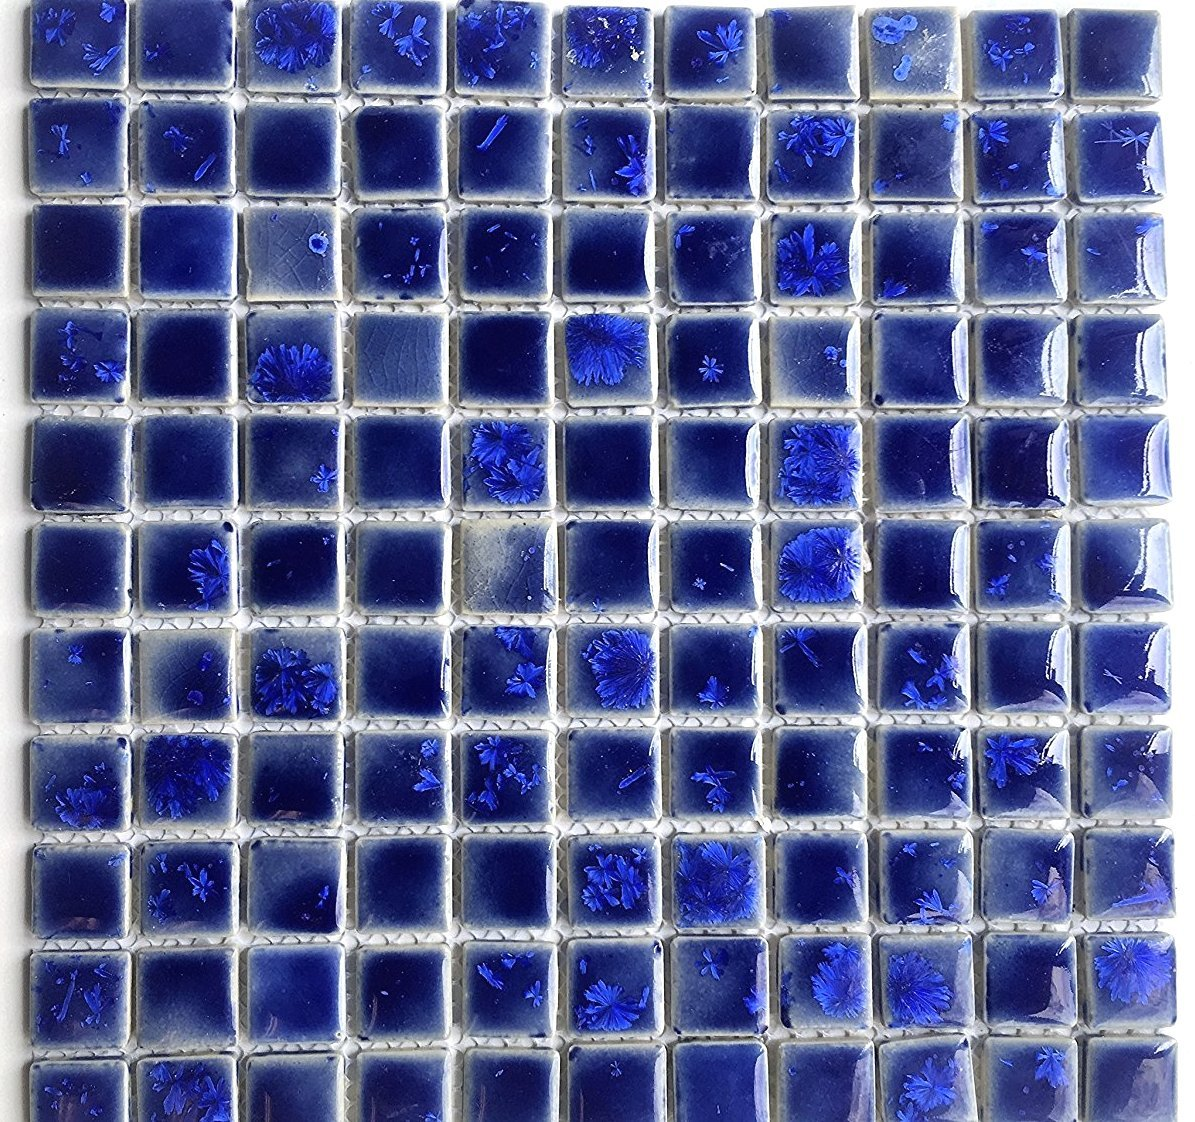 Amazon.com: 1x1 Blue Shimmering Glossy Finish Porcelain Mosaic Tile ...